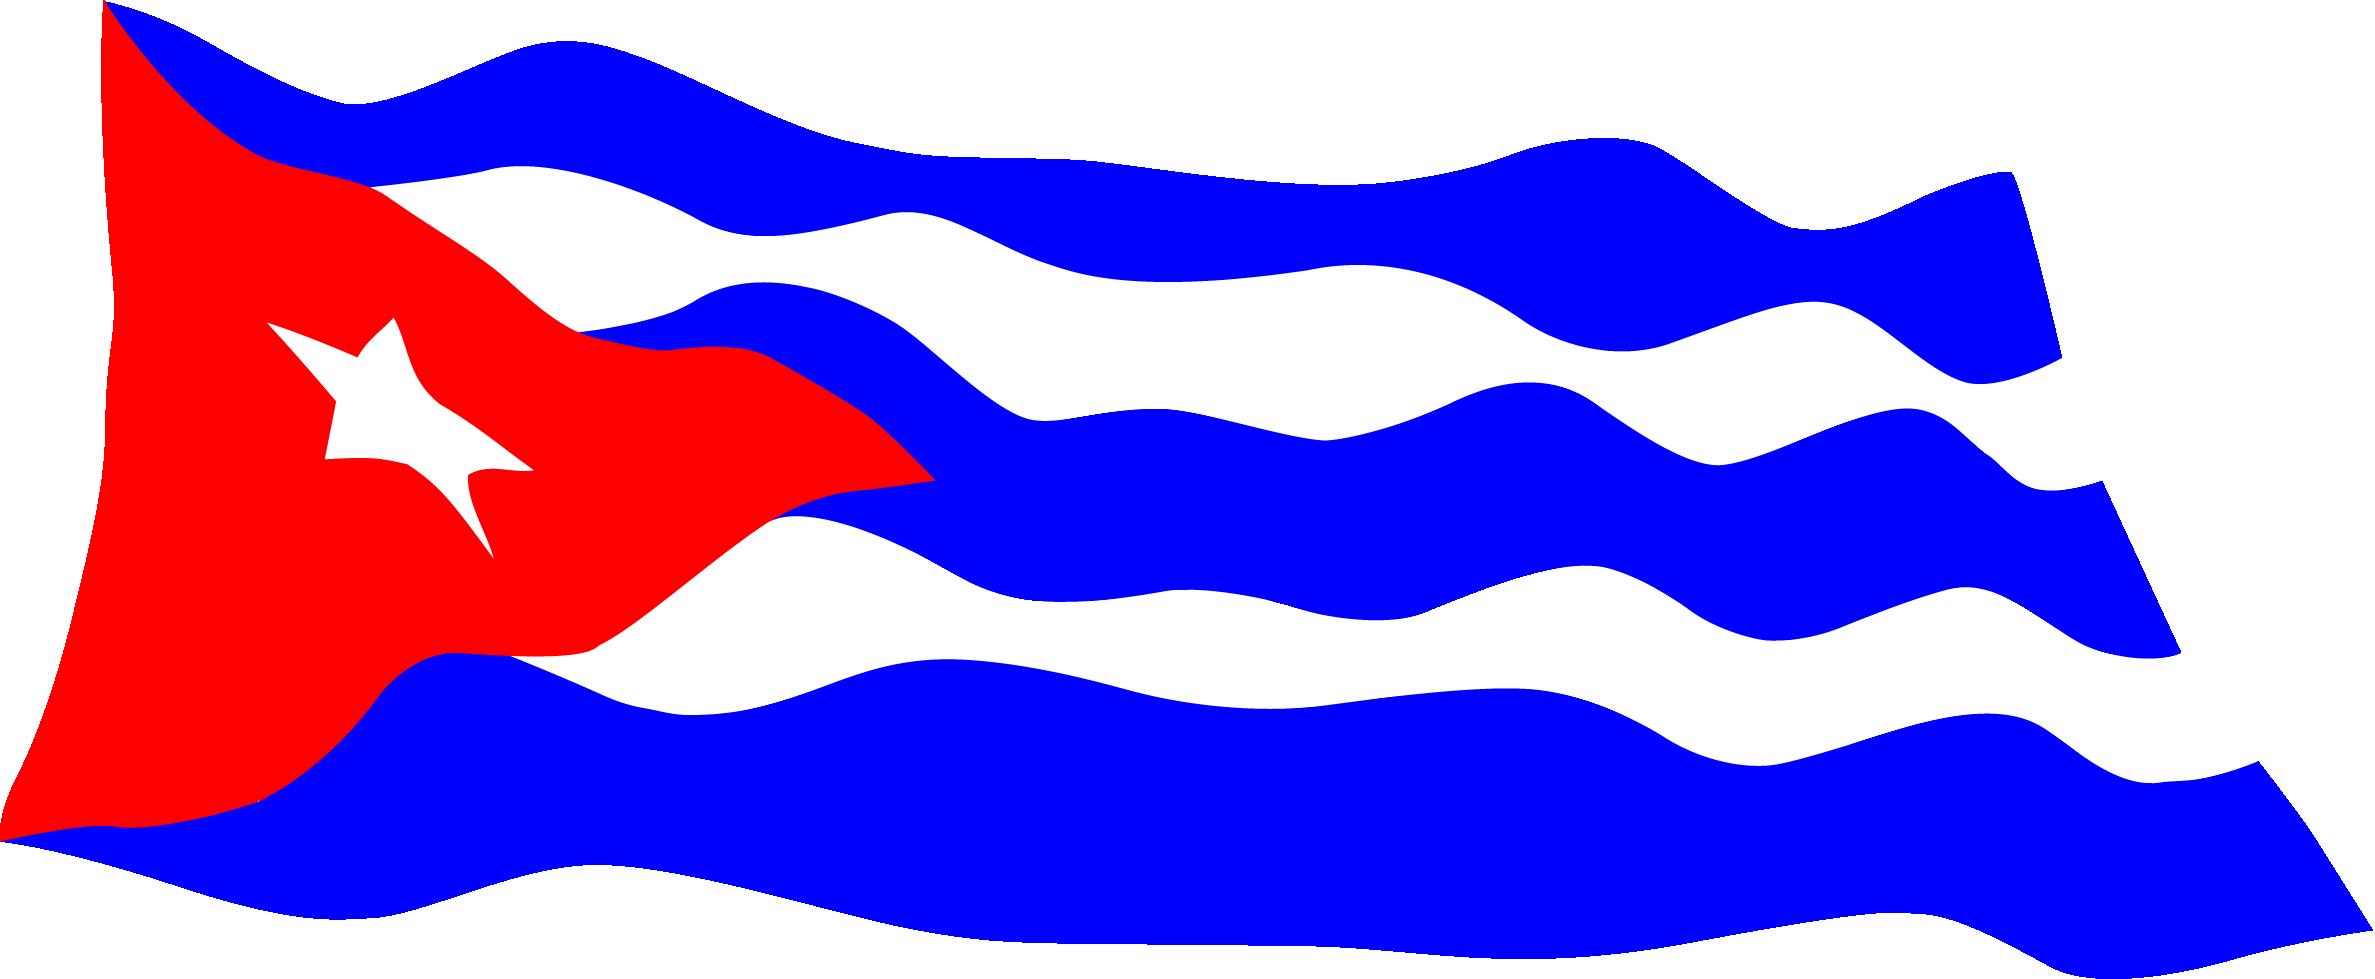 Bandera Cubana By Guillemaro On DeviantArt